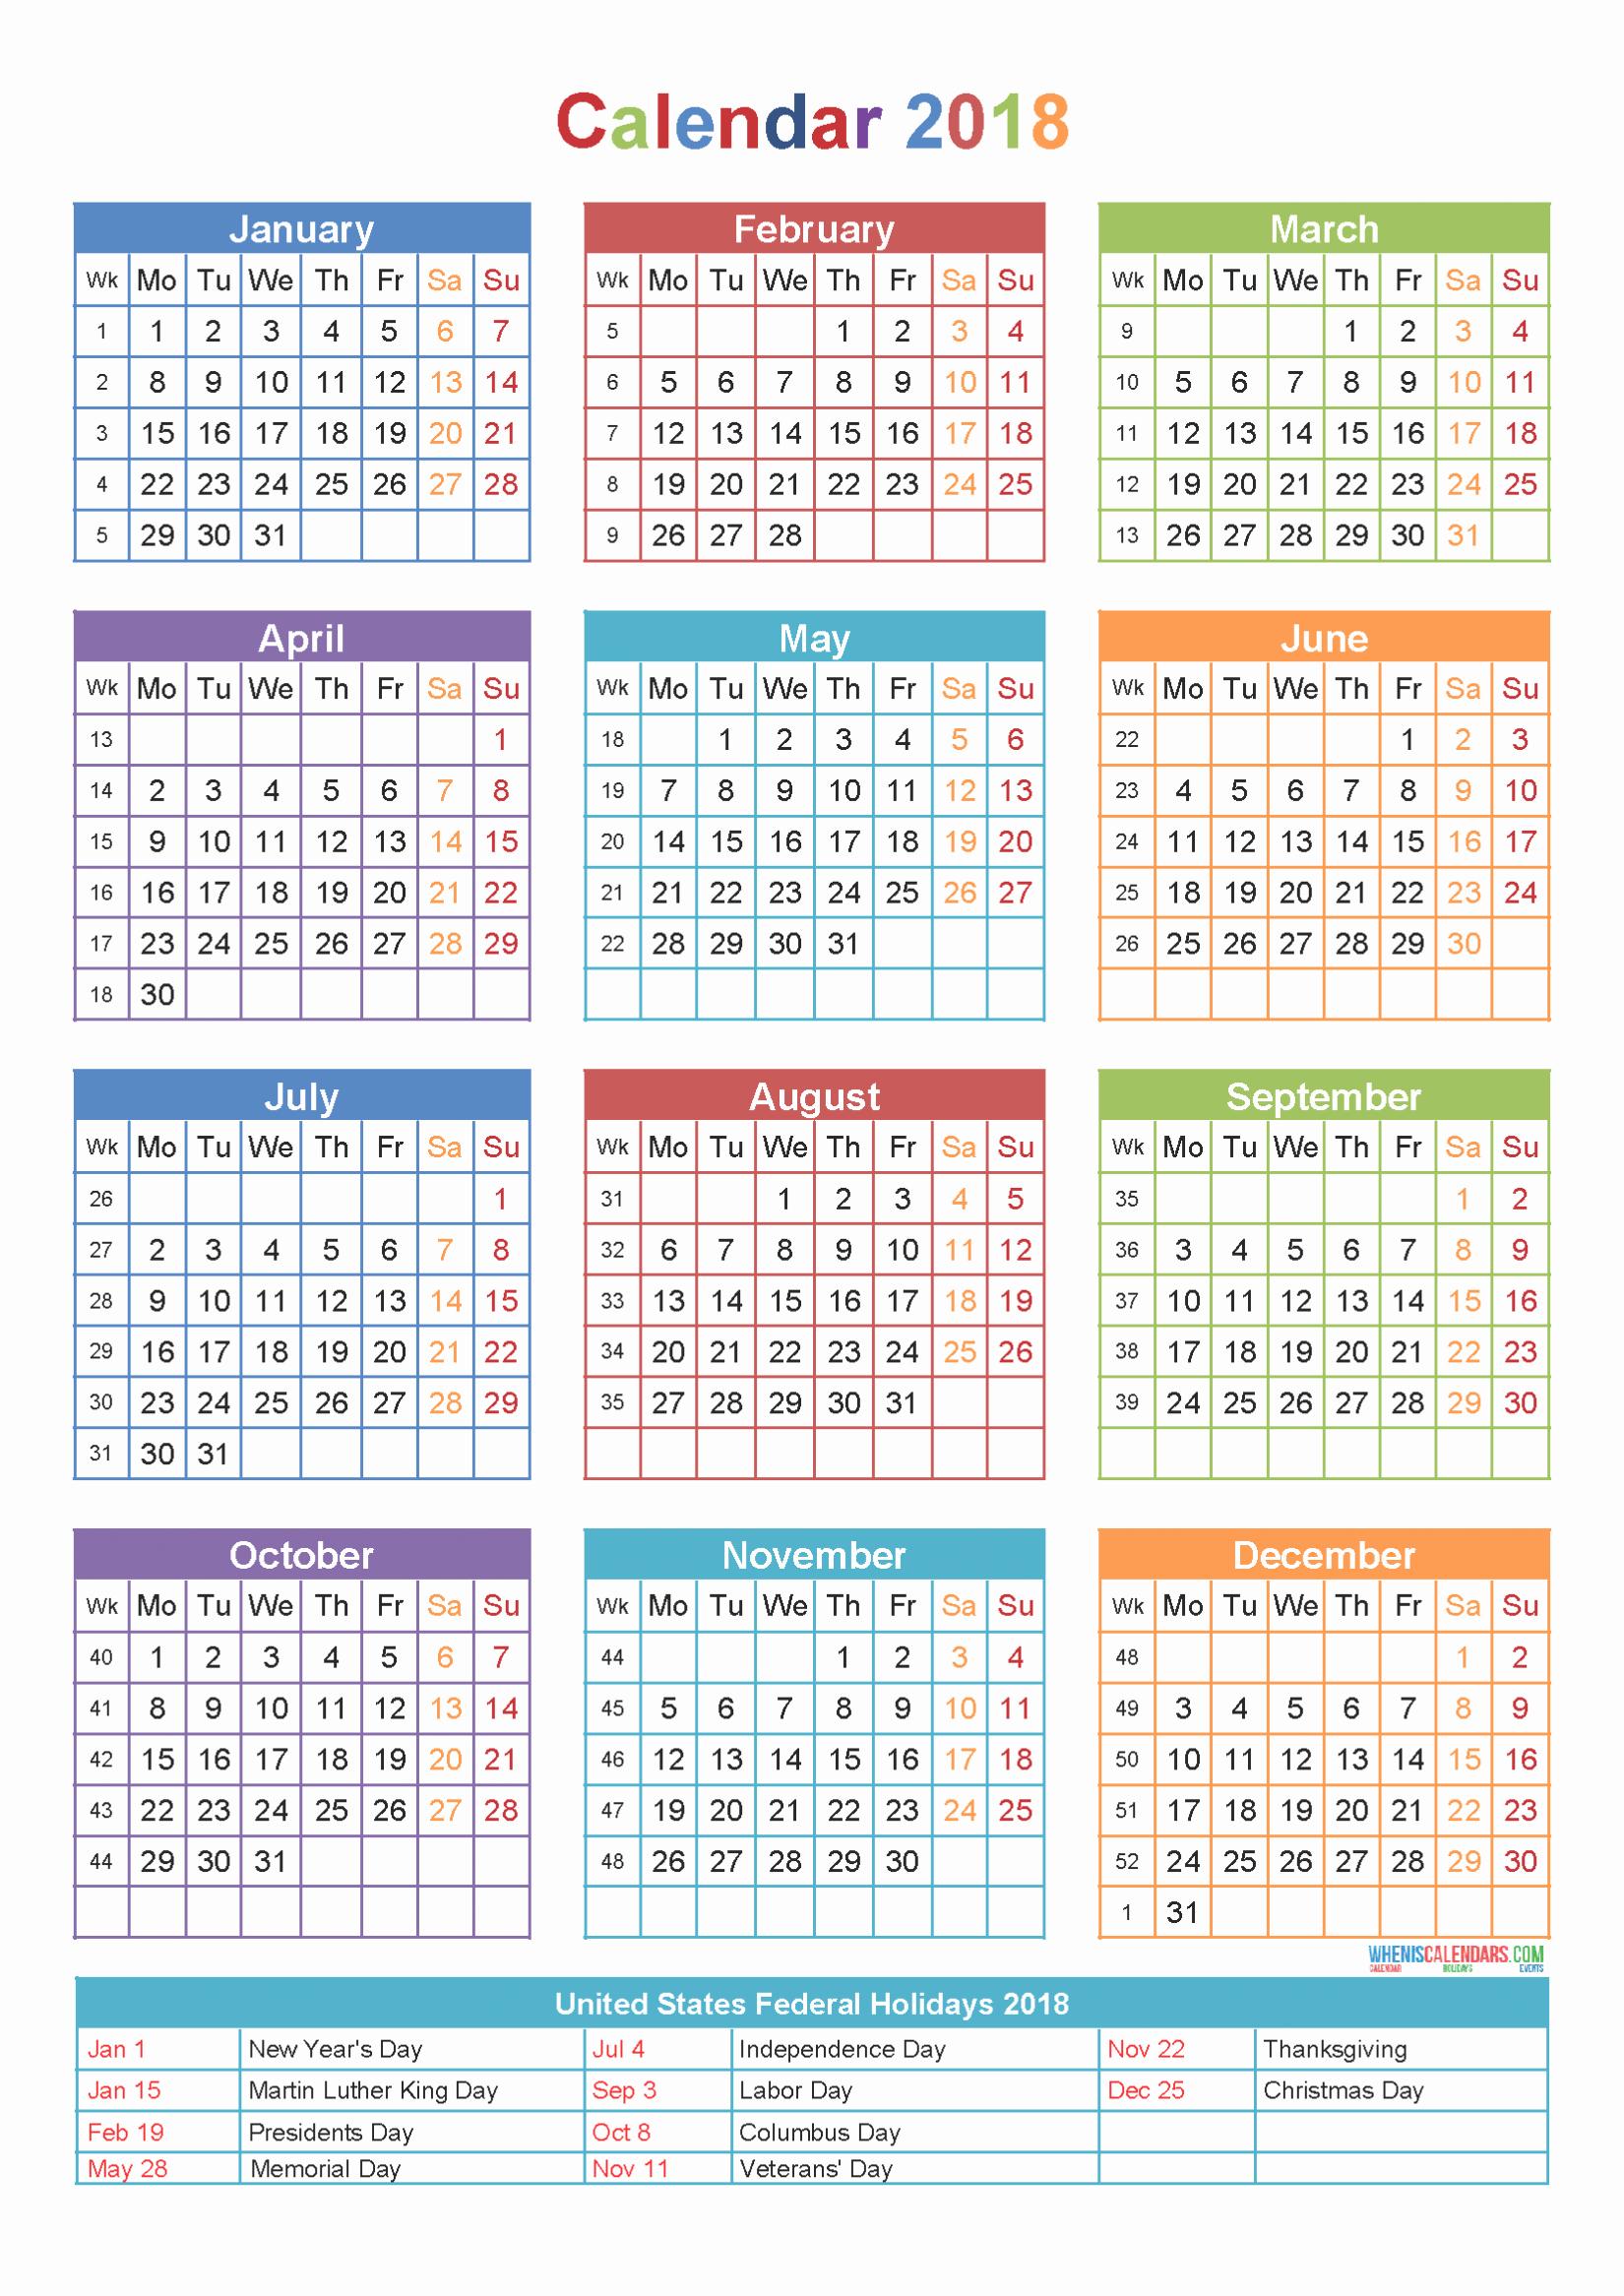 Calendar 2018 Printable with Holidays Elegant 2018 Calendar Printable with Holidays Excel Word Usa